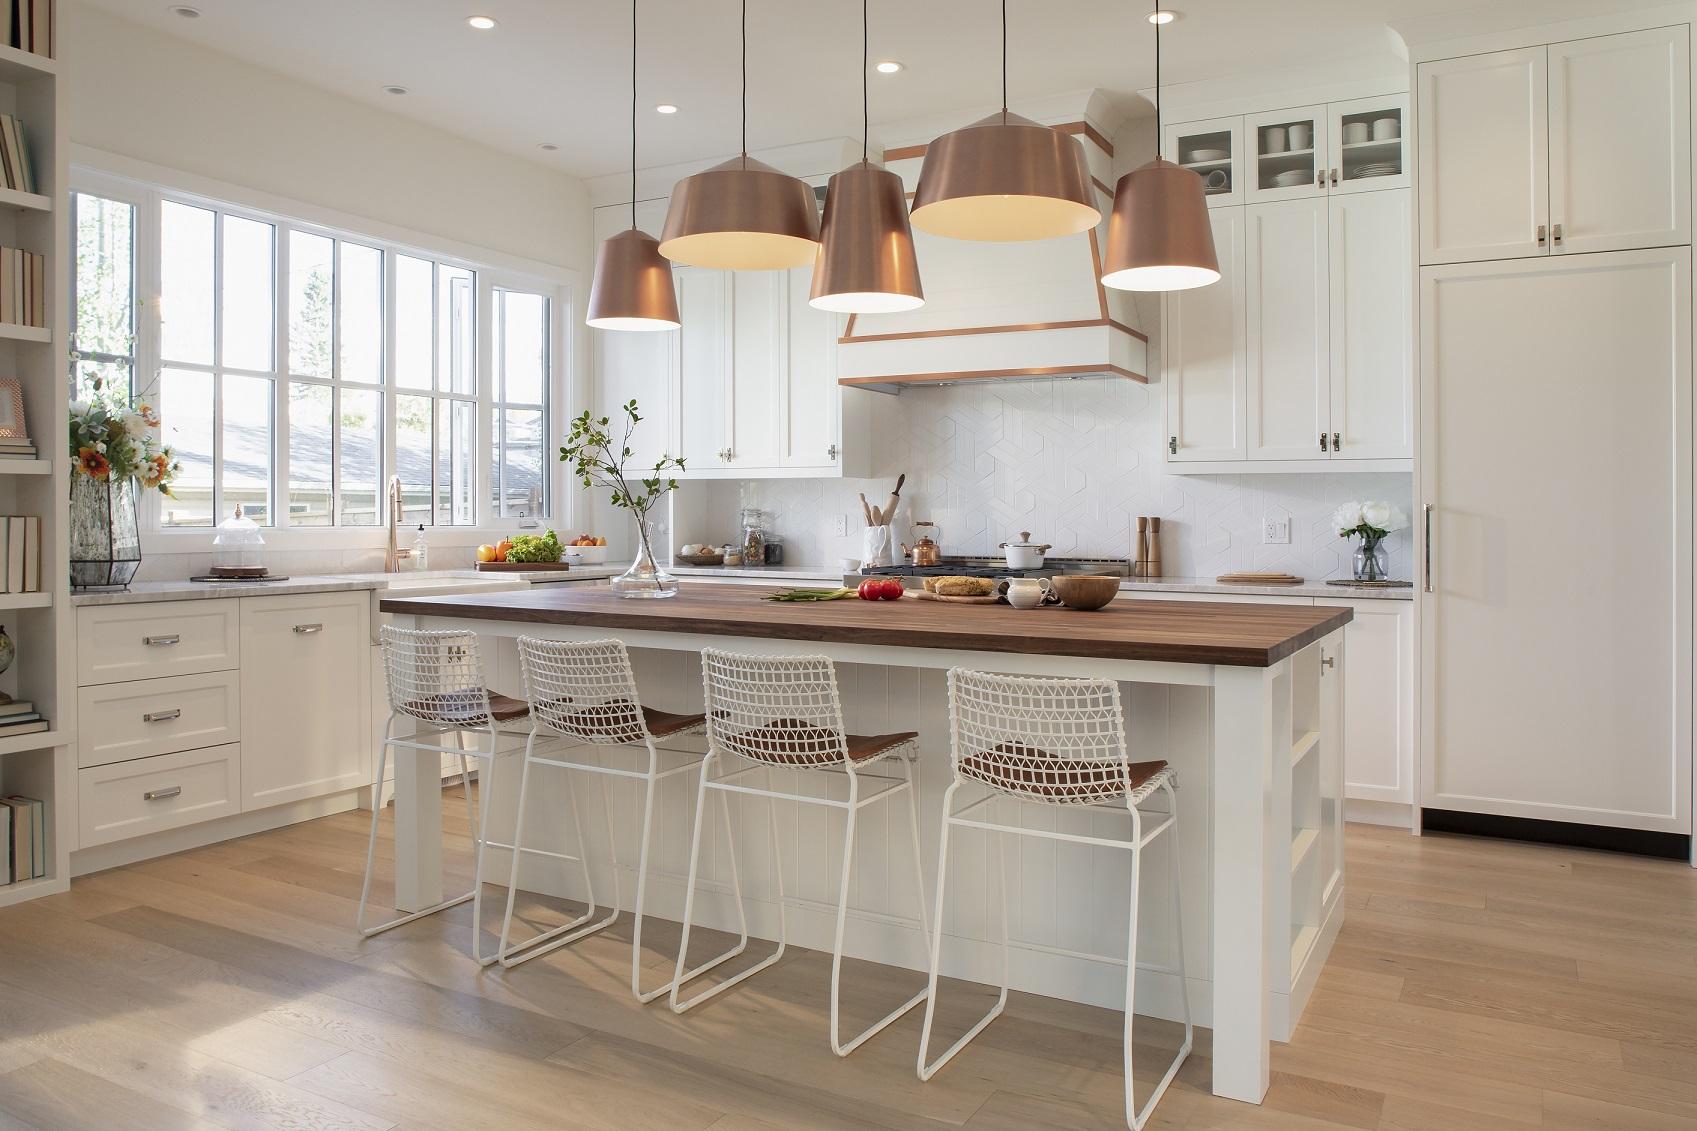 White-home-showcase-interior-kitchen-with-copper-pendant-lights